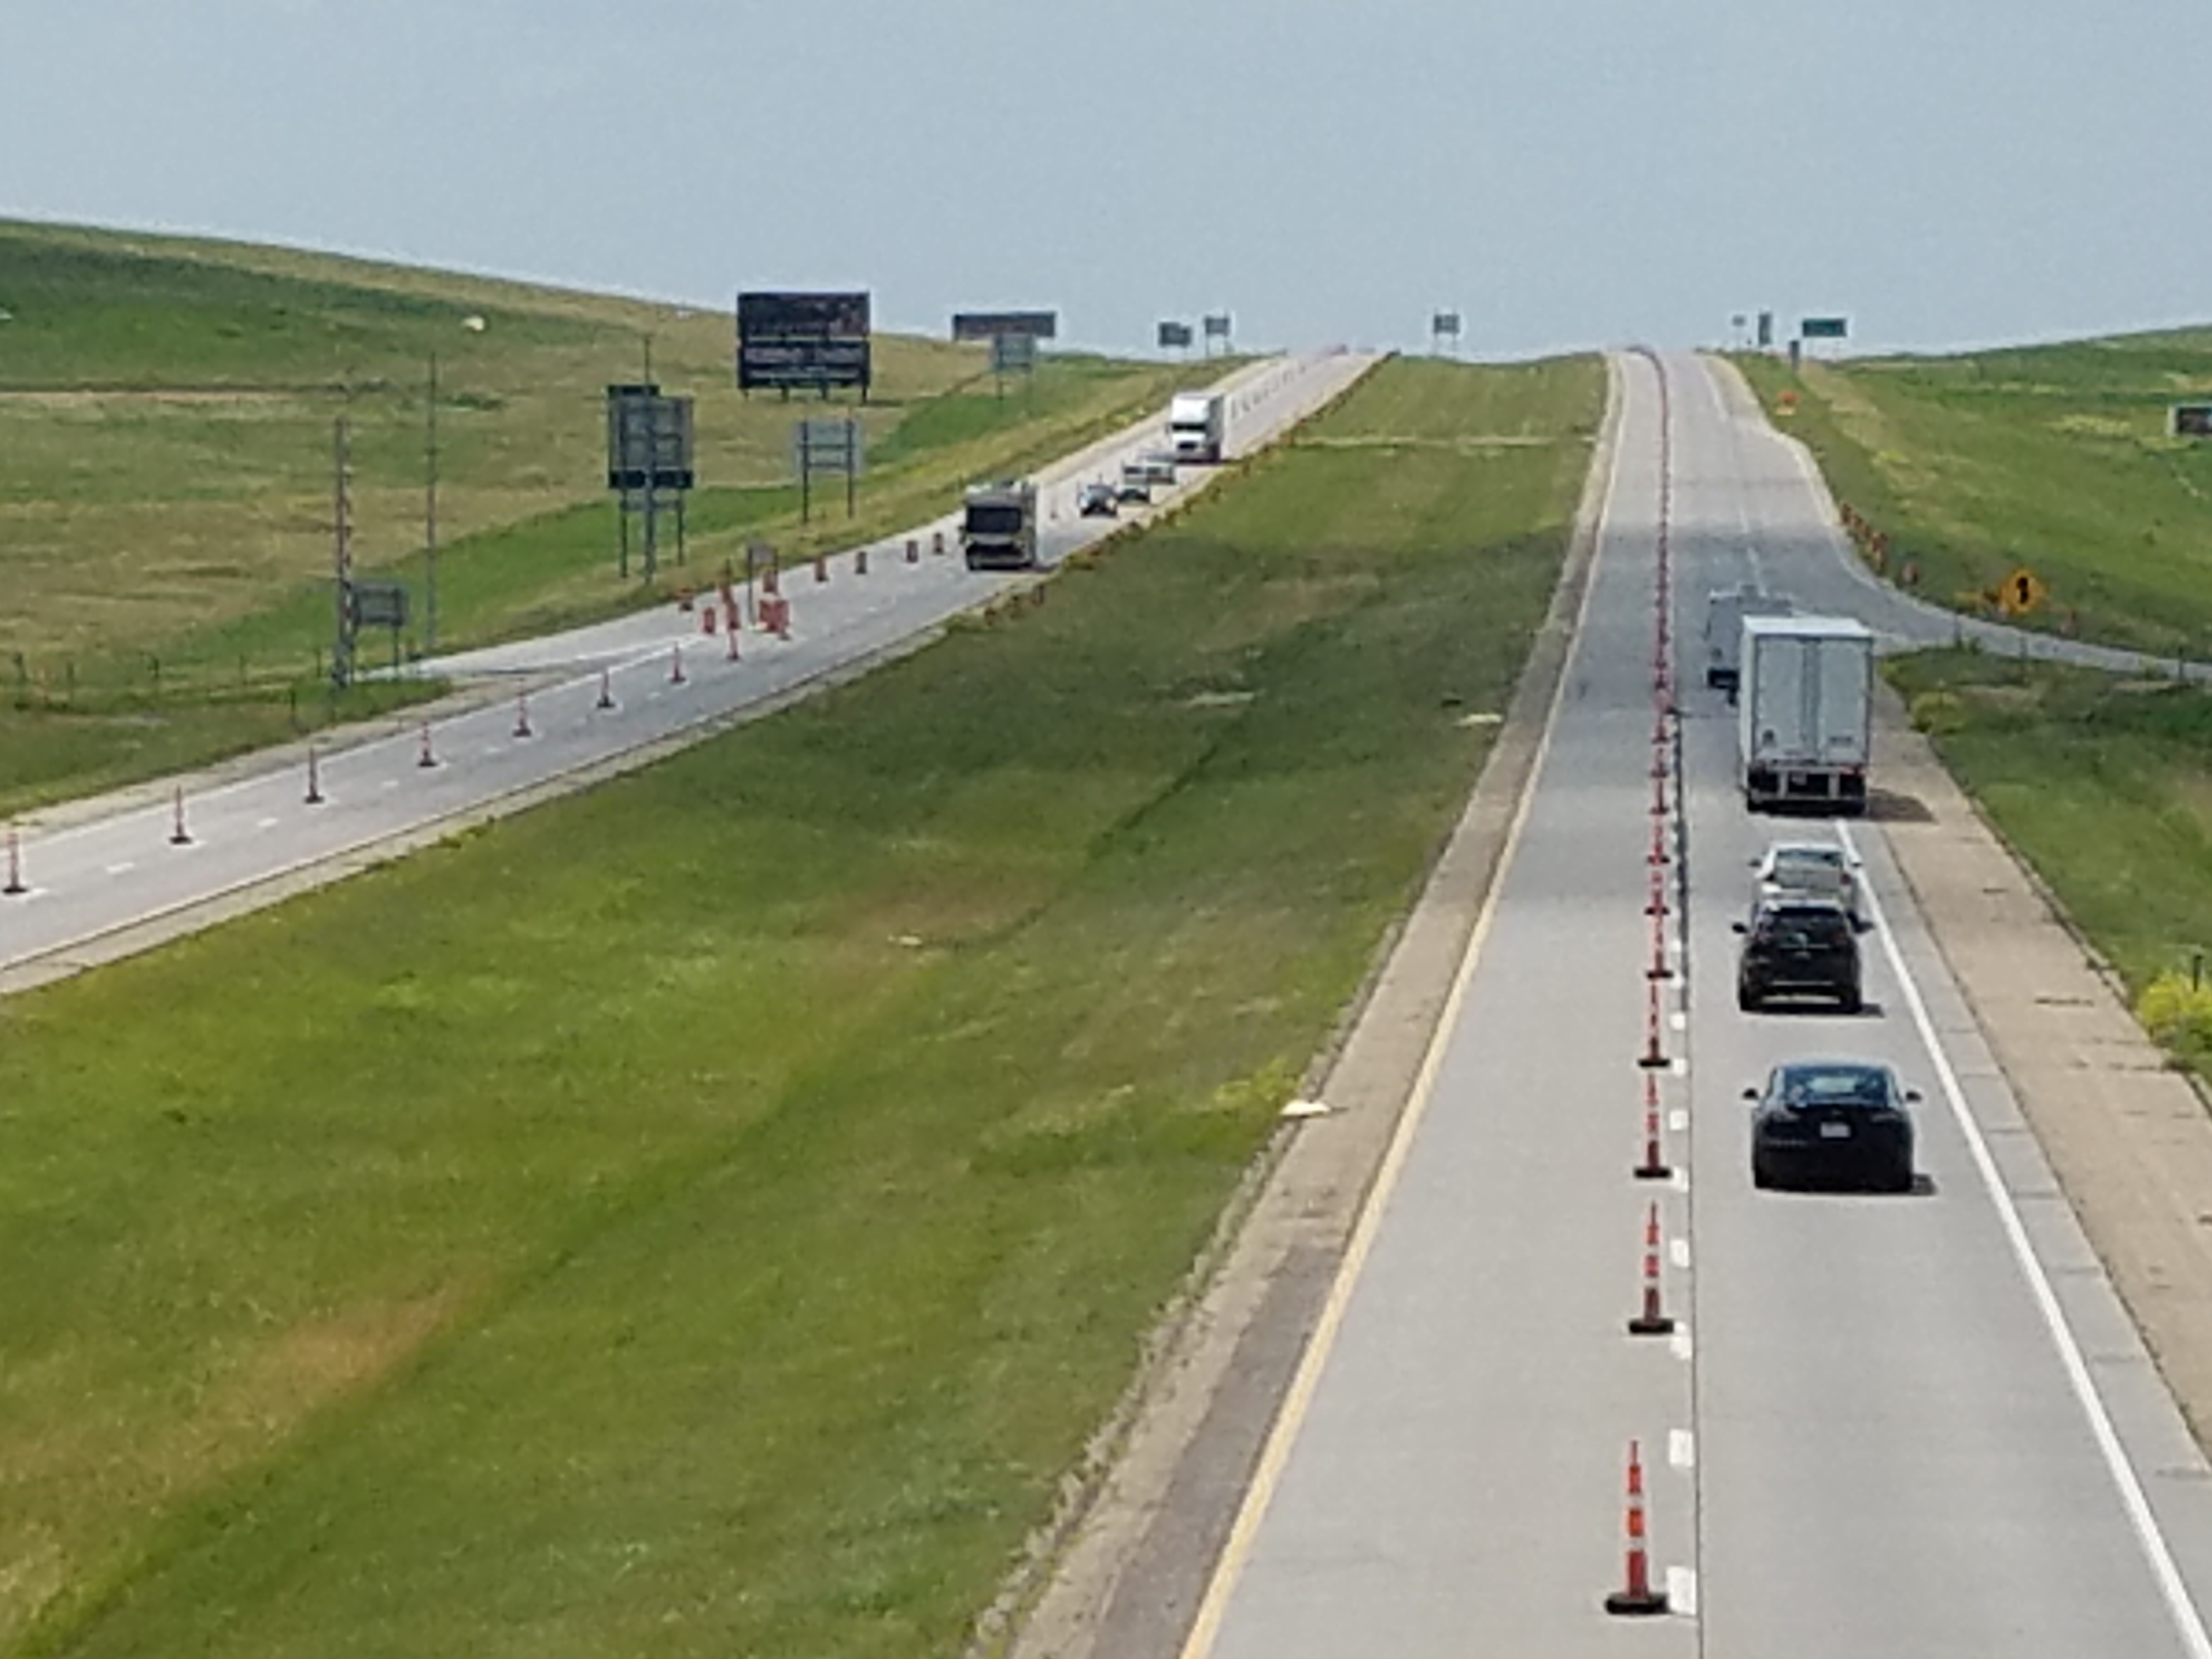 South Dakota Transportation Department To Host Input Sessions On STIP Plan